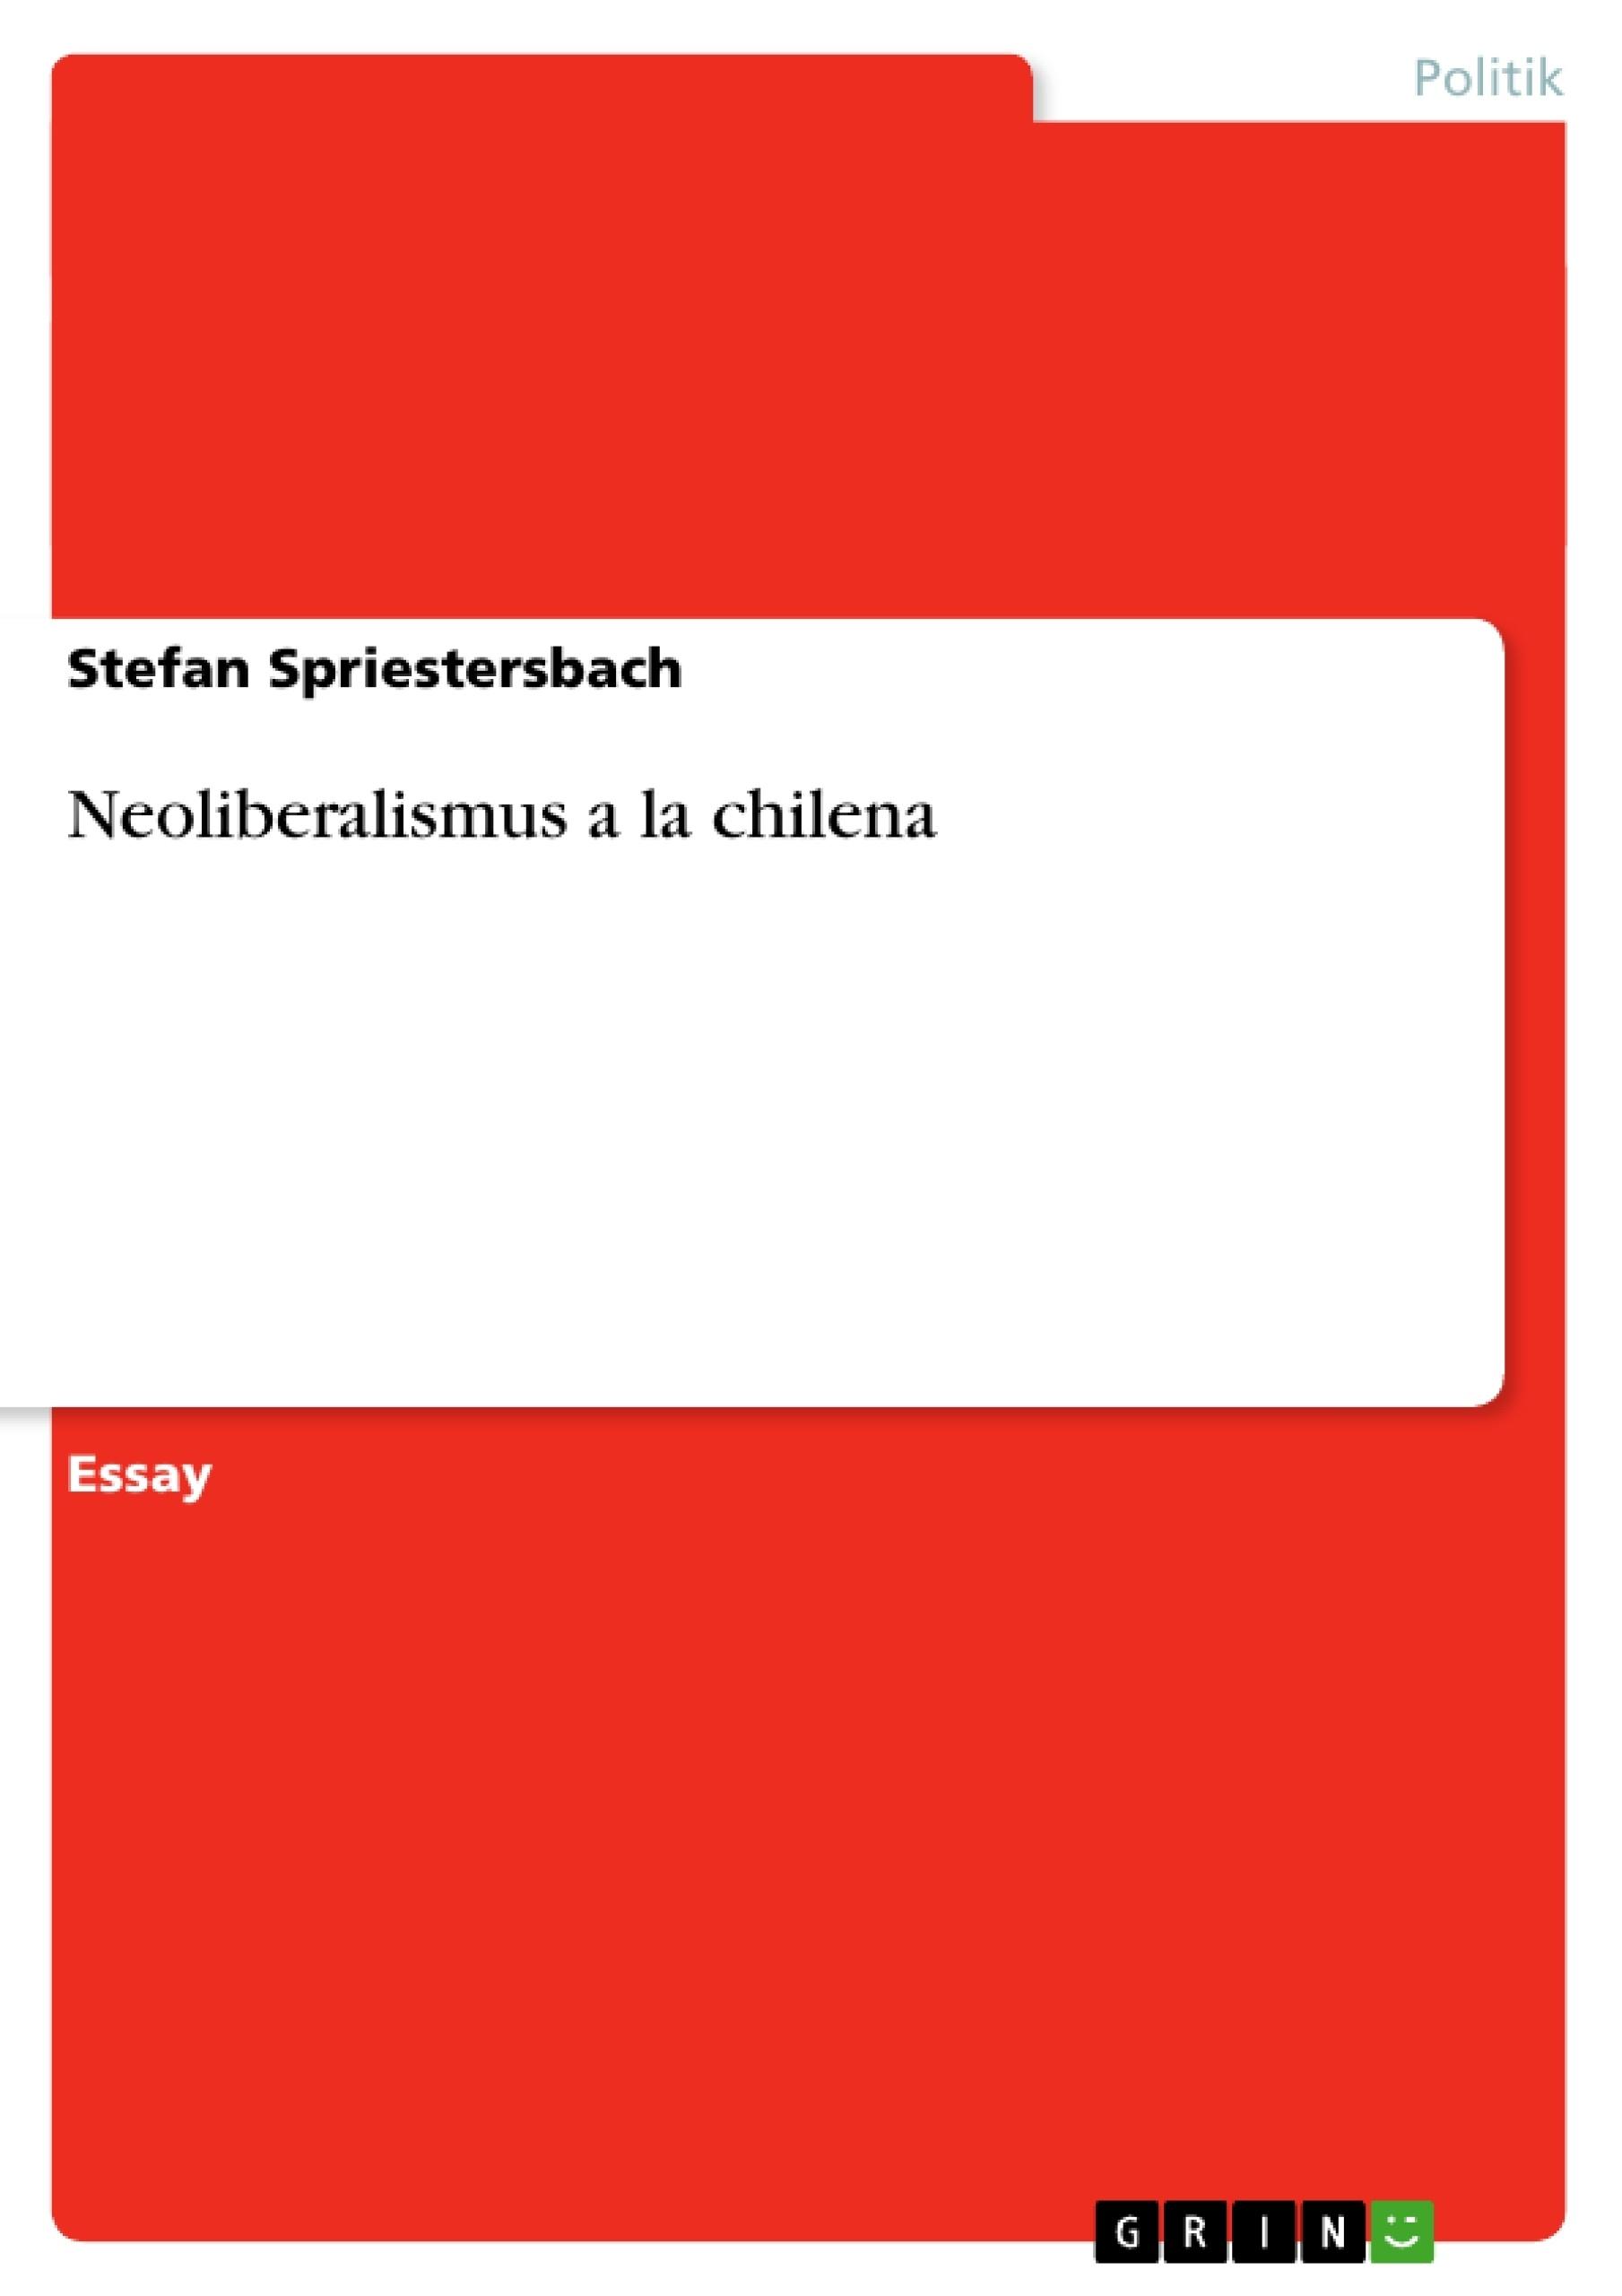 Titel: Neoliberalismus a la chilena